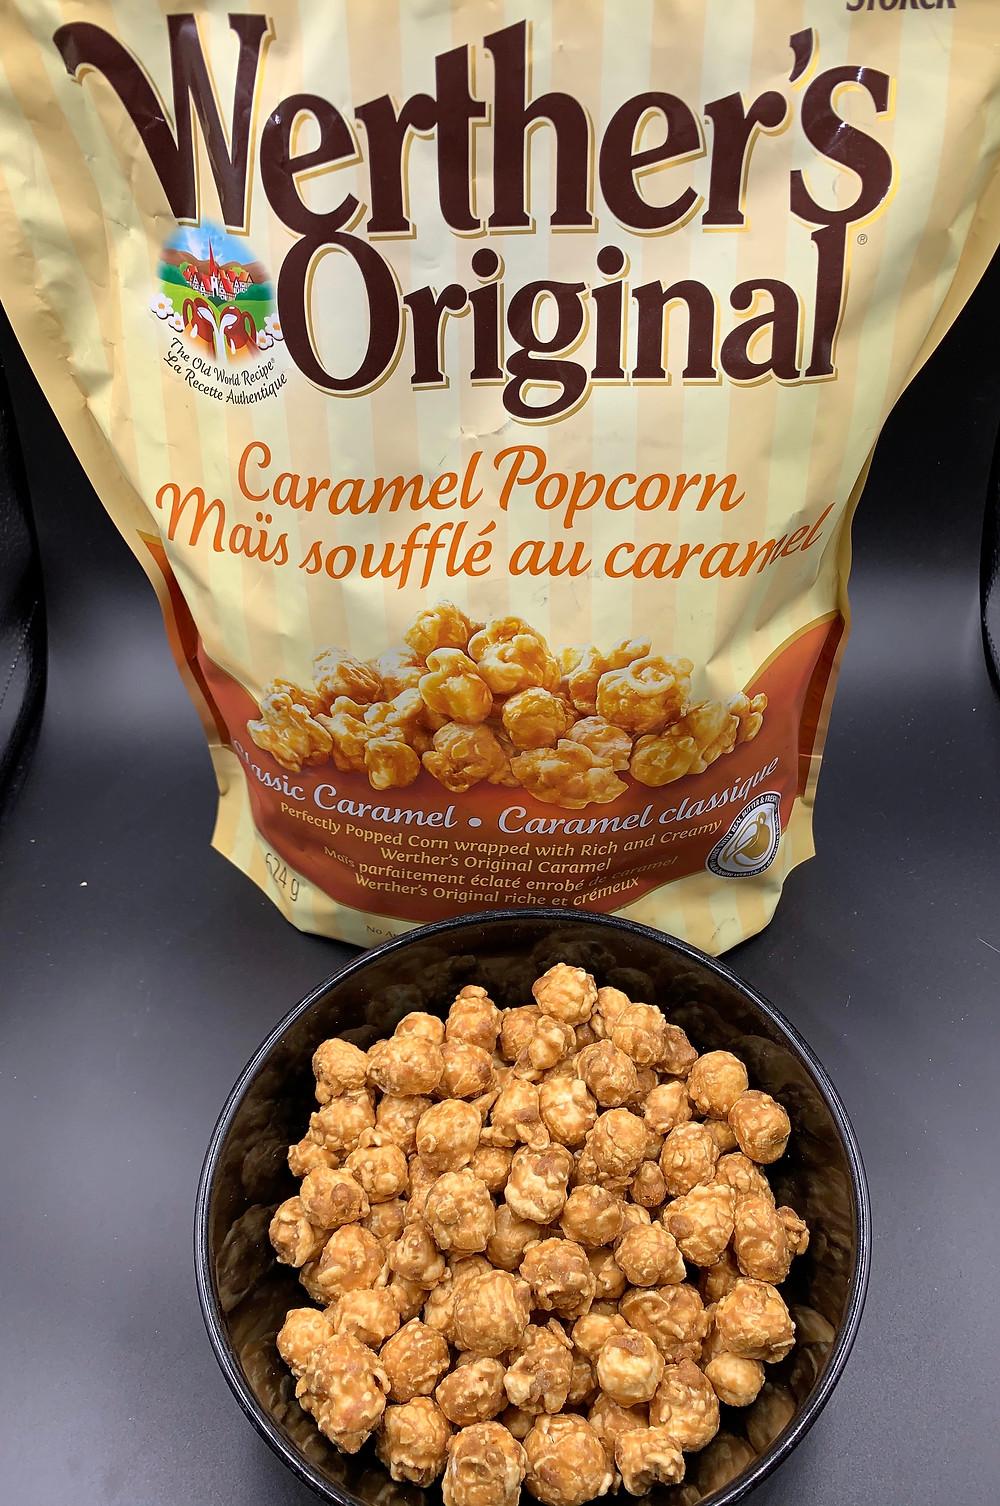 Costco Werther's Original Caramel Popcorn